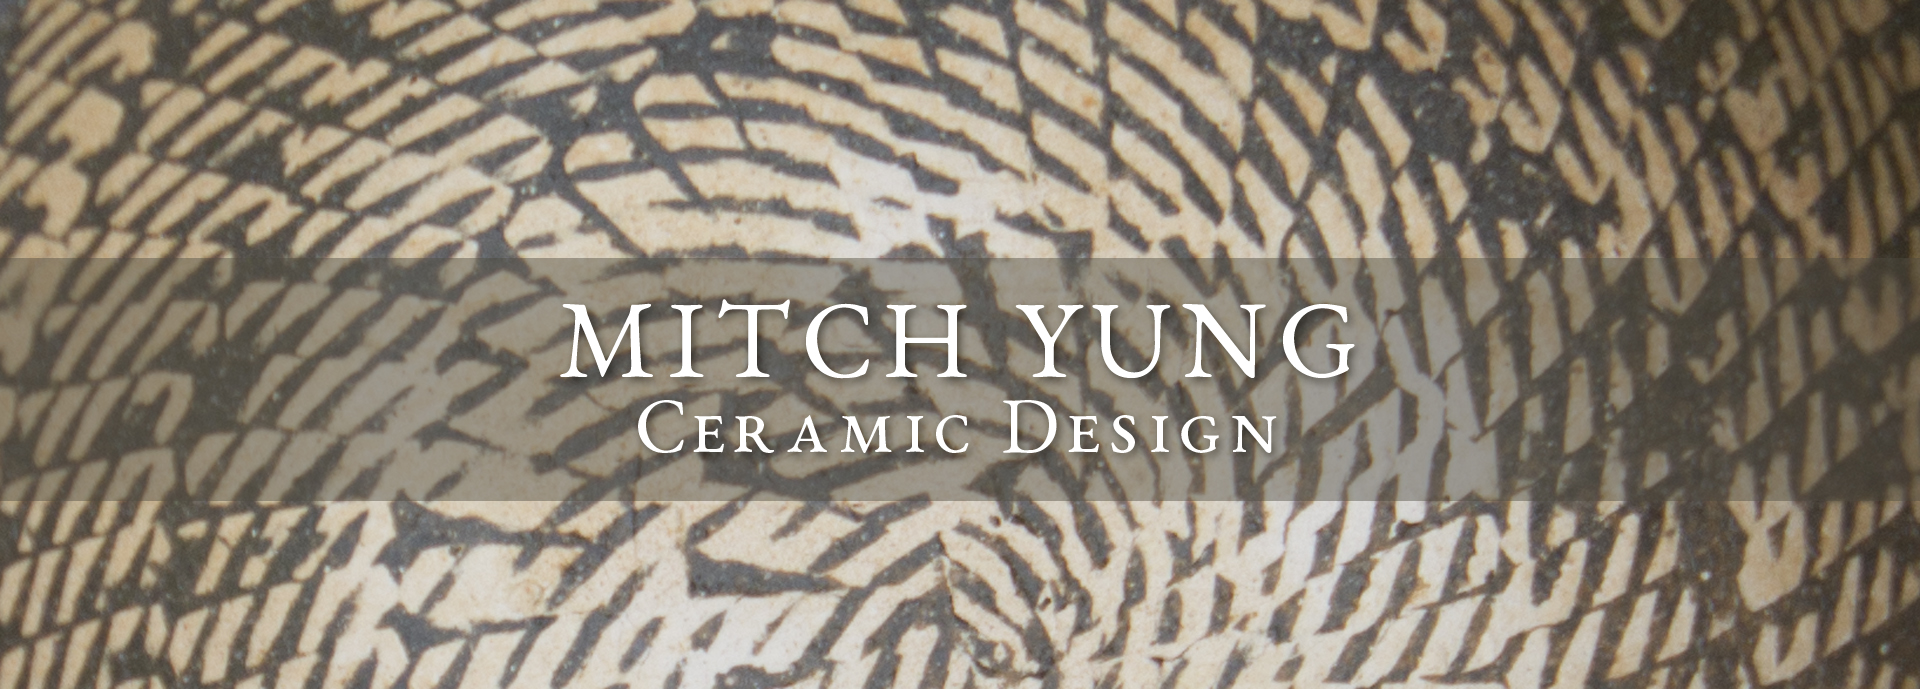 Mitch Yung